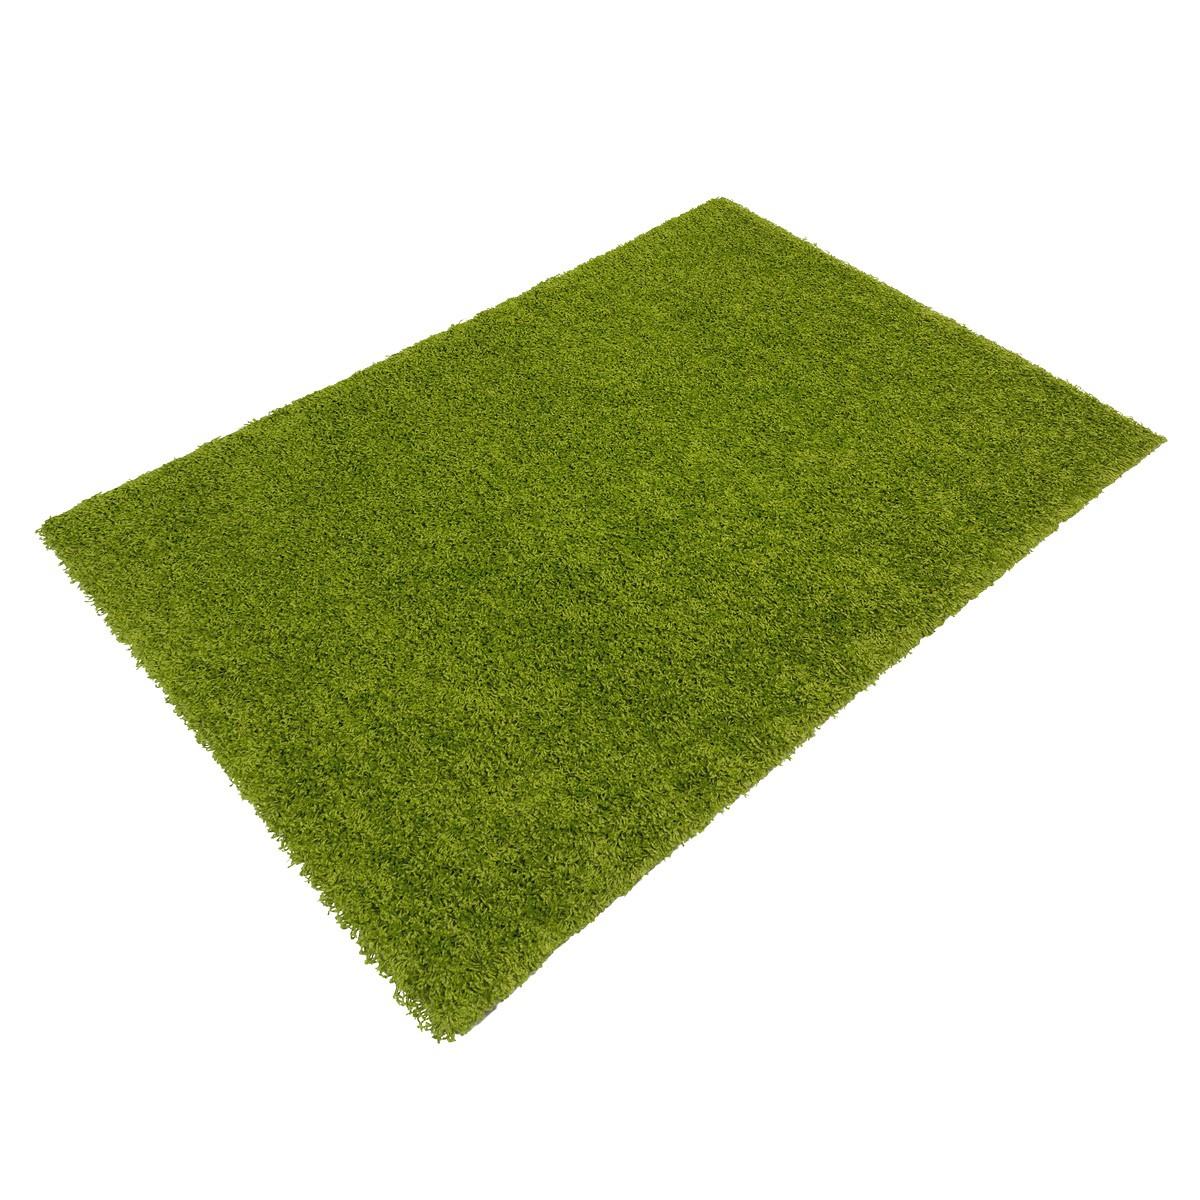 Langflor Teppich grün Uni Hochflor versch Größen